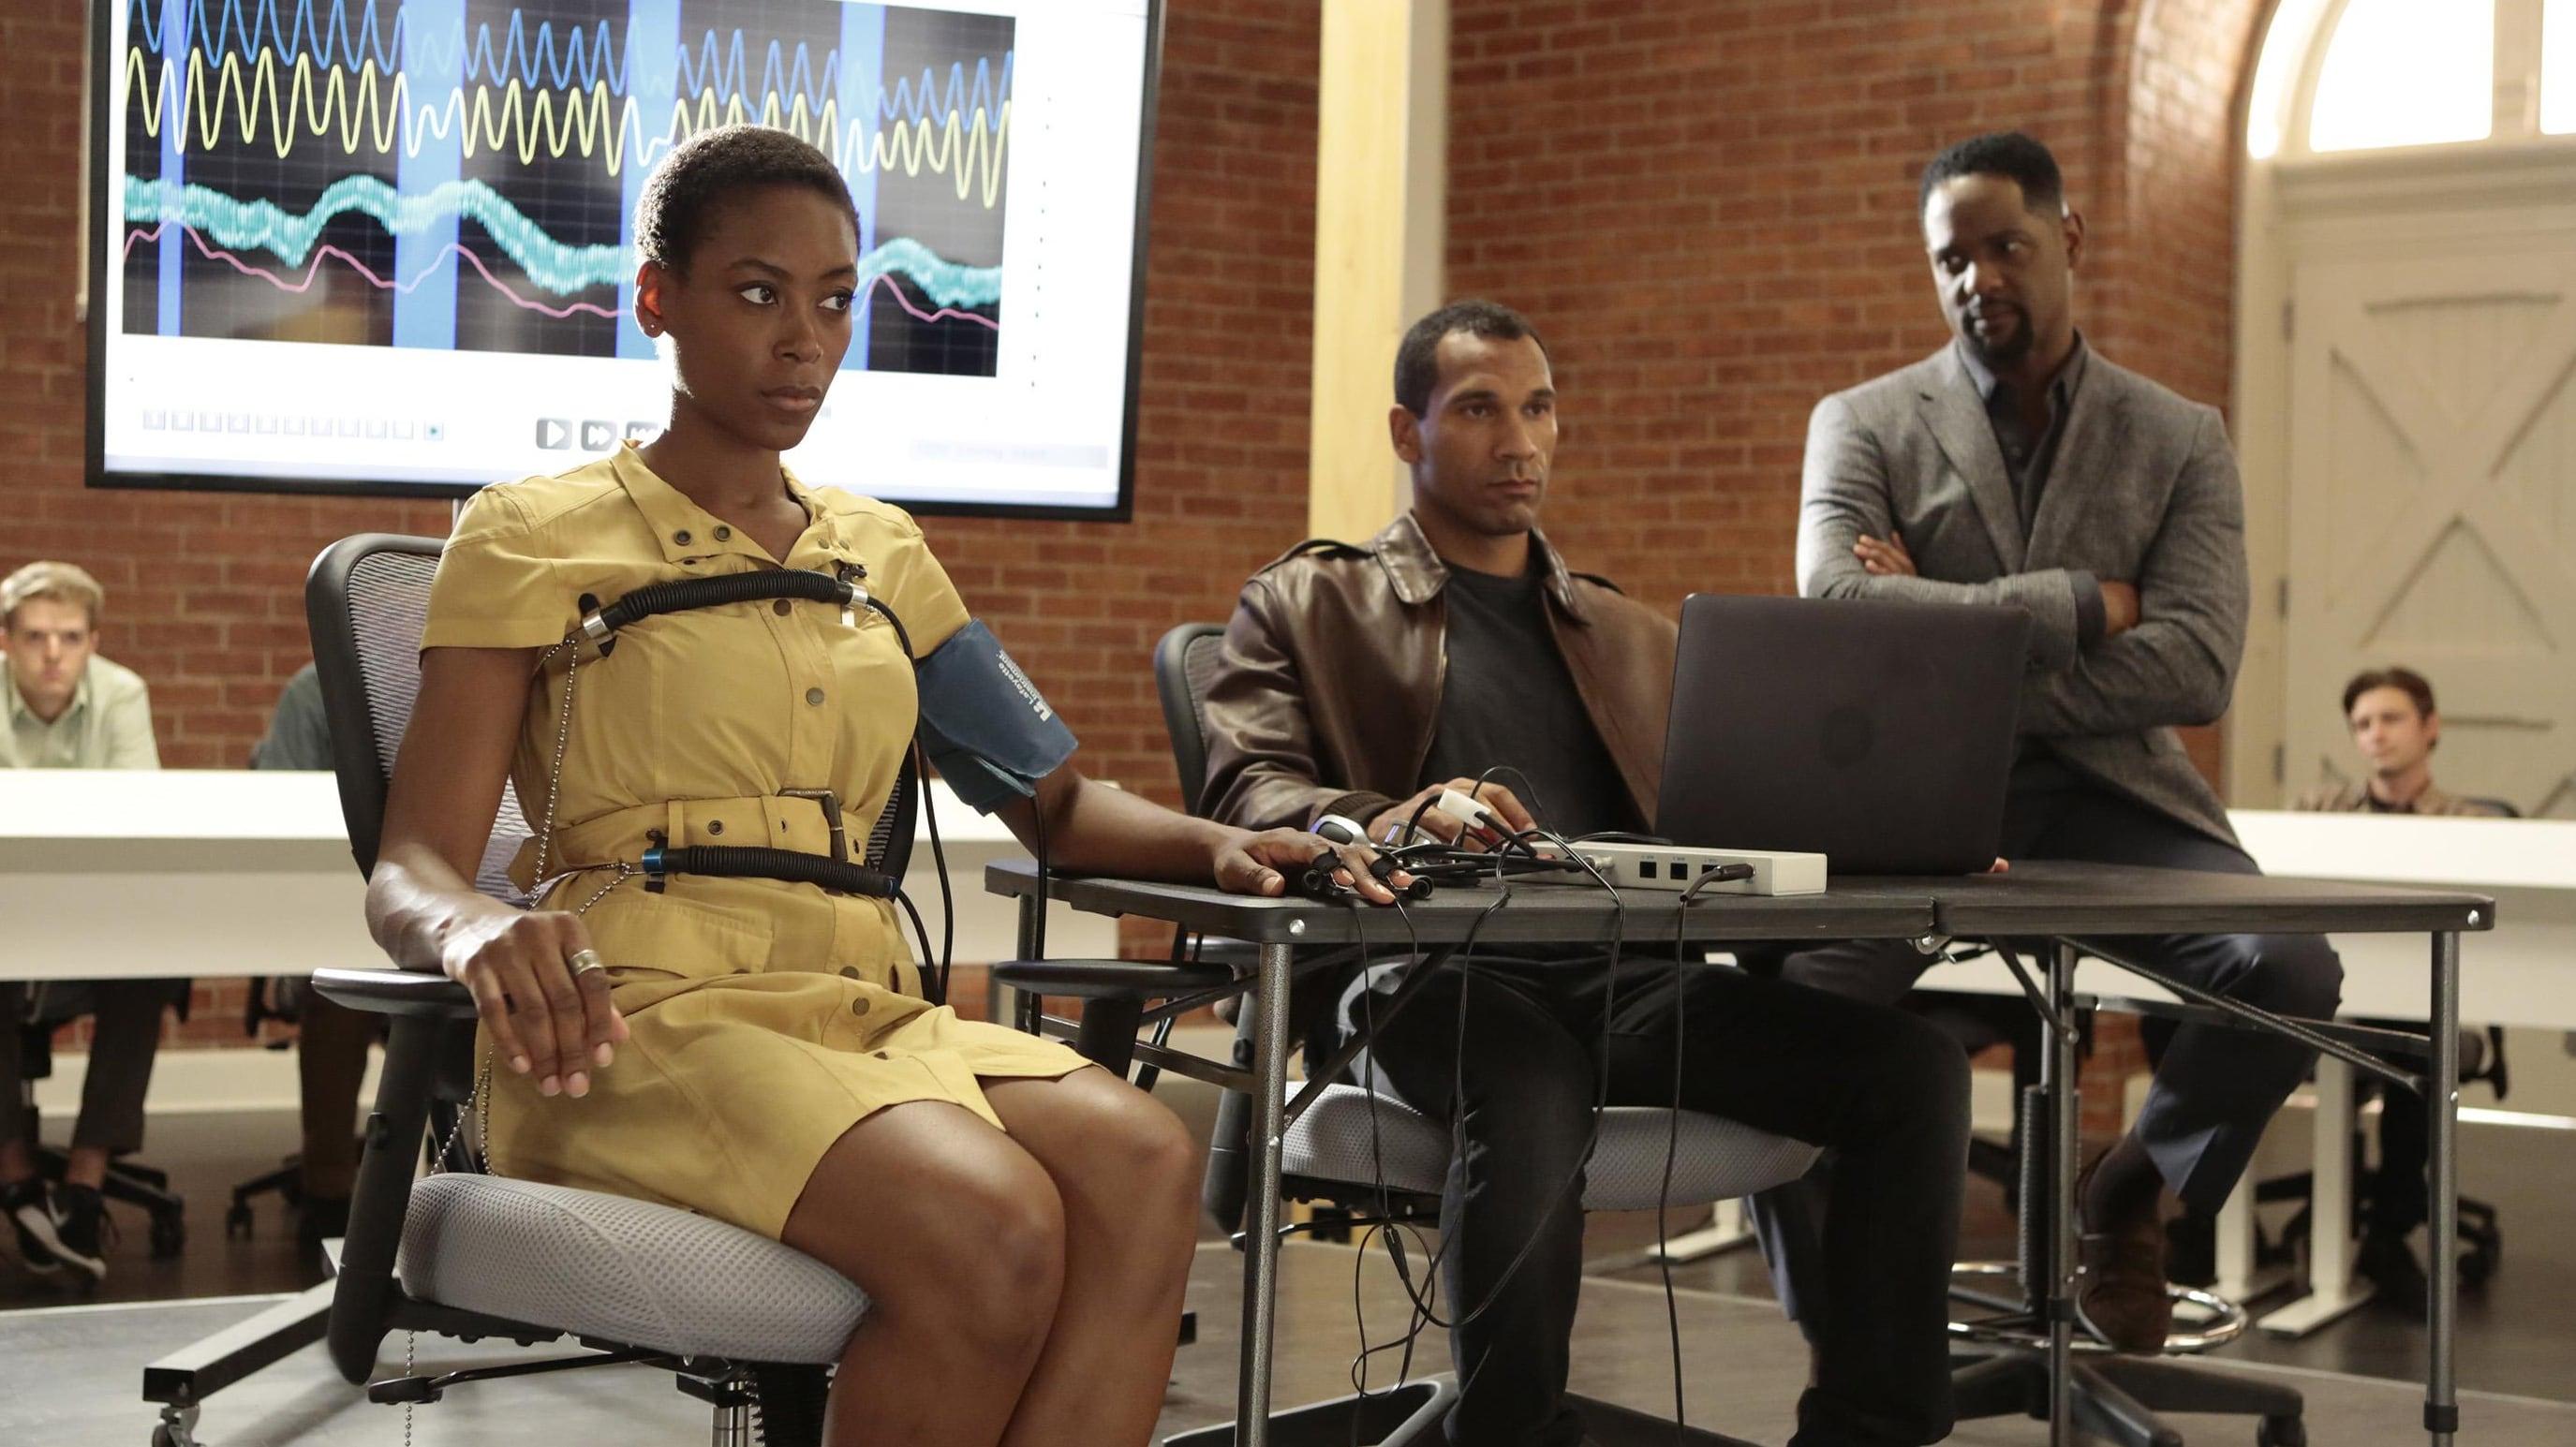 Quantico Season 1 Episode 1 Download